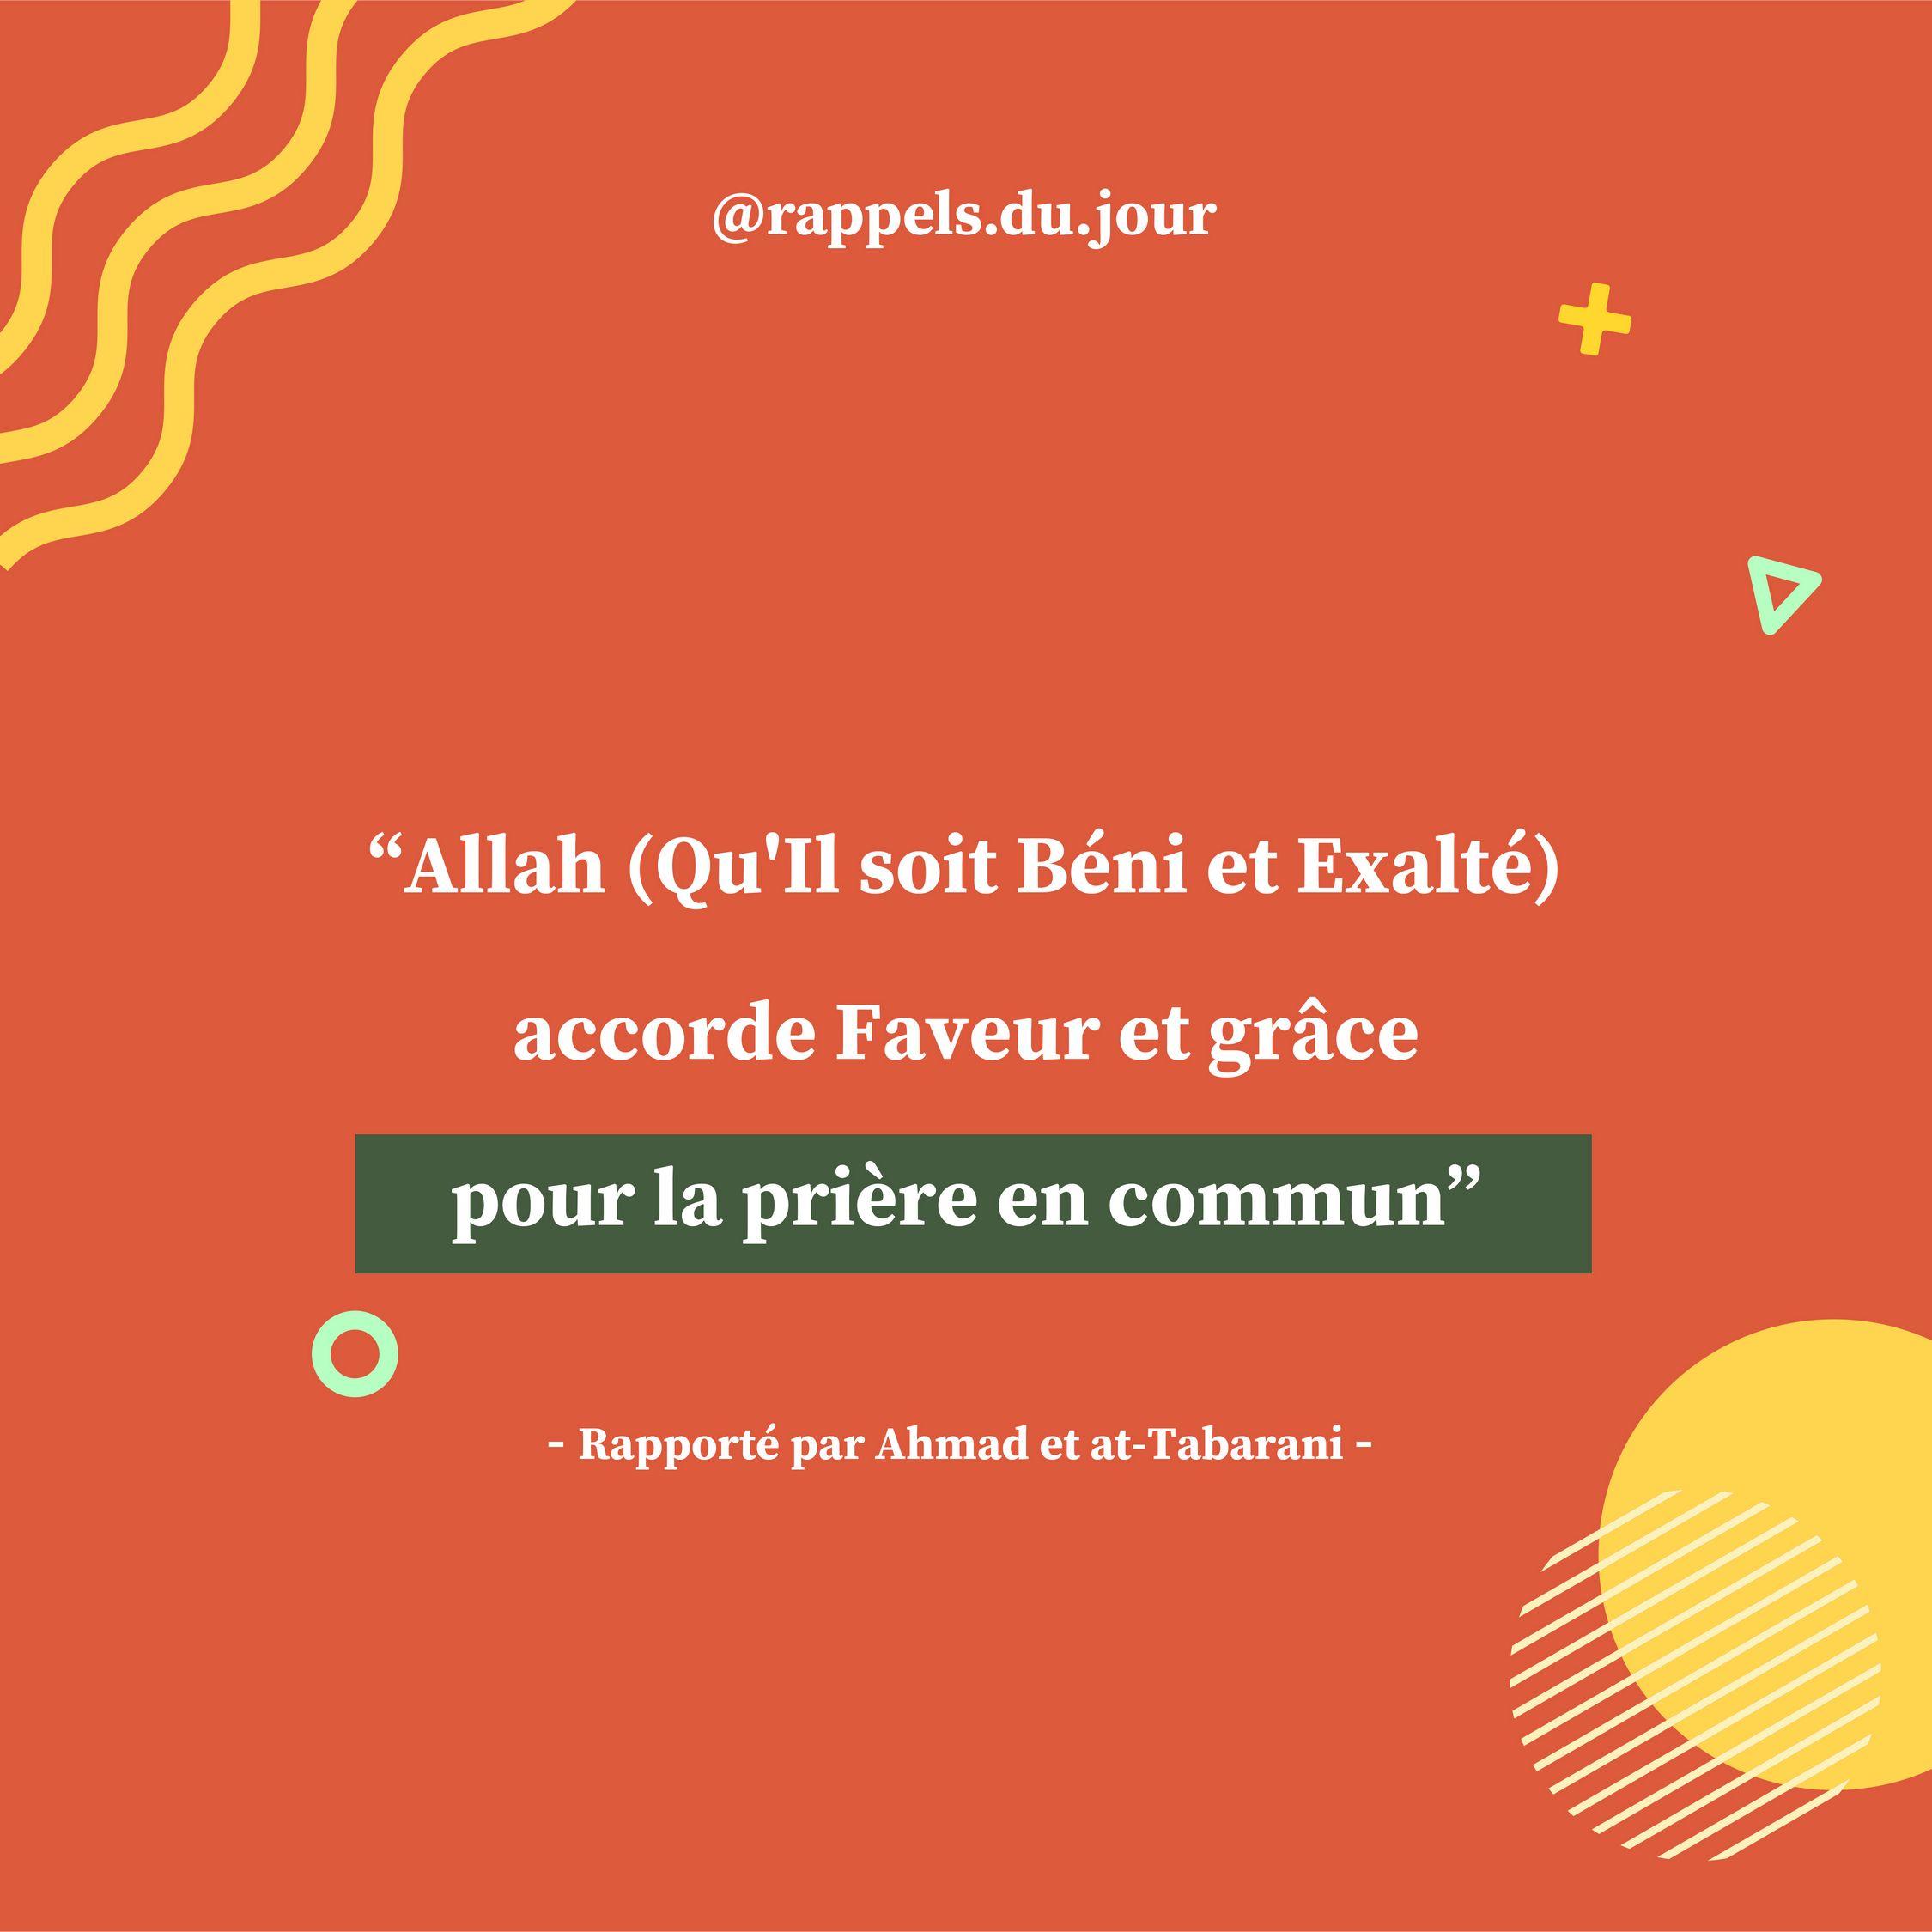 Hadith 'Umar Ben al-Khattab - La recommendation de la priere en groupe